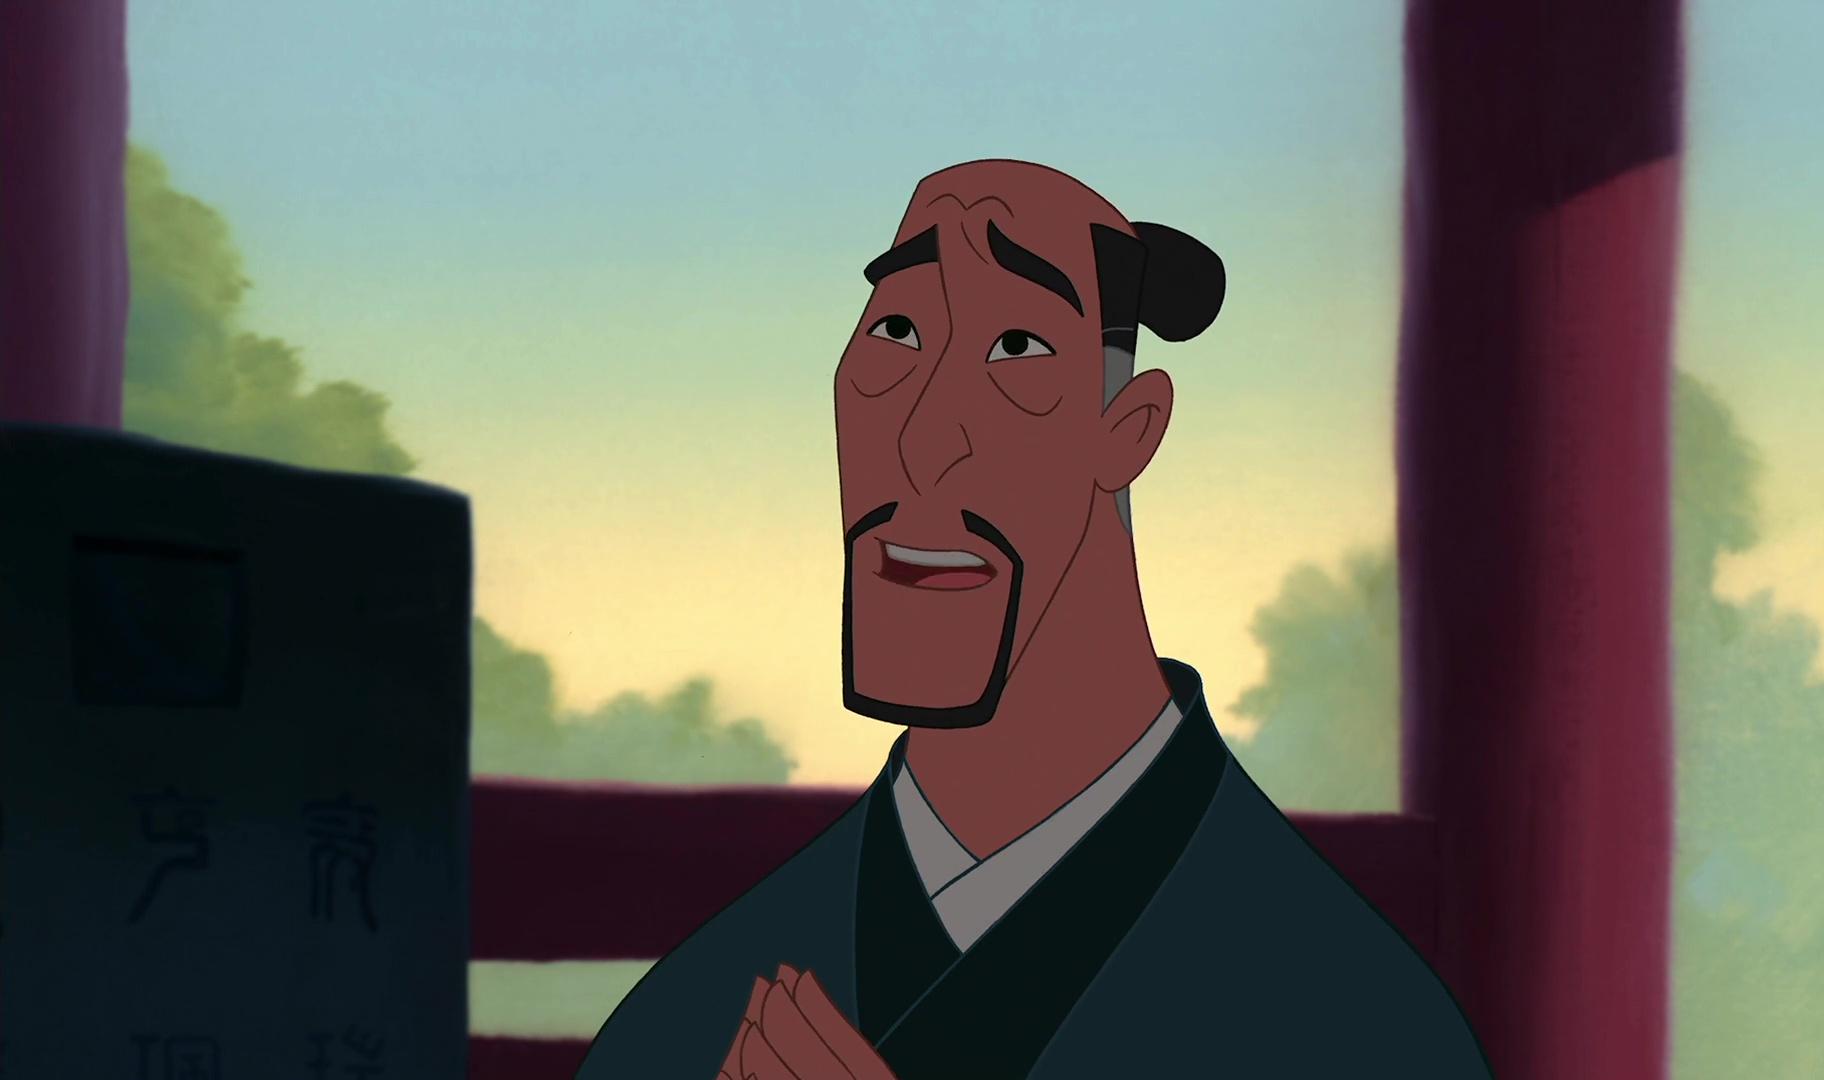 Uncategorized Fa Zhou fa zhou personnage dans disney planet character mulan